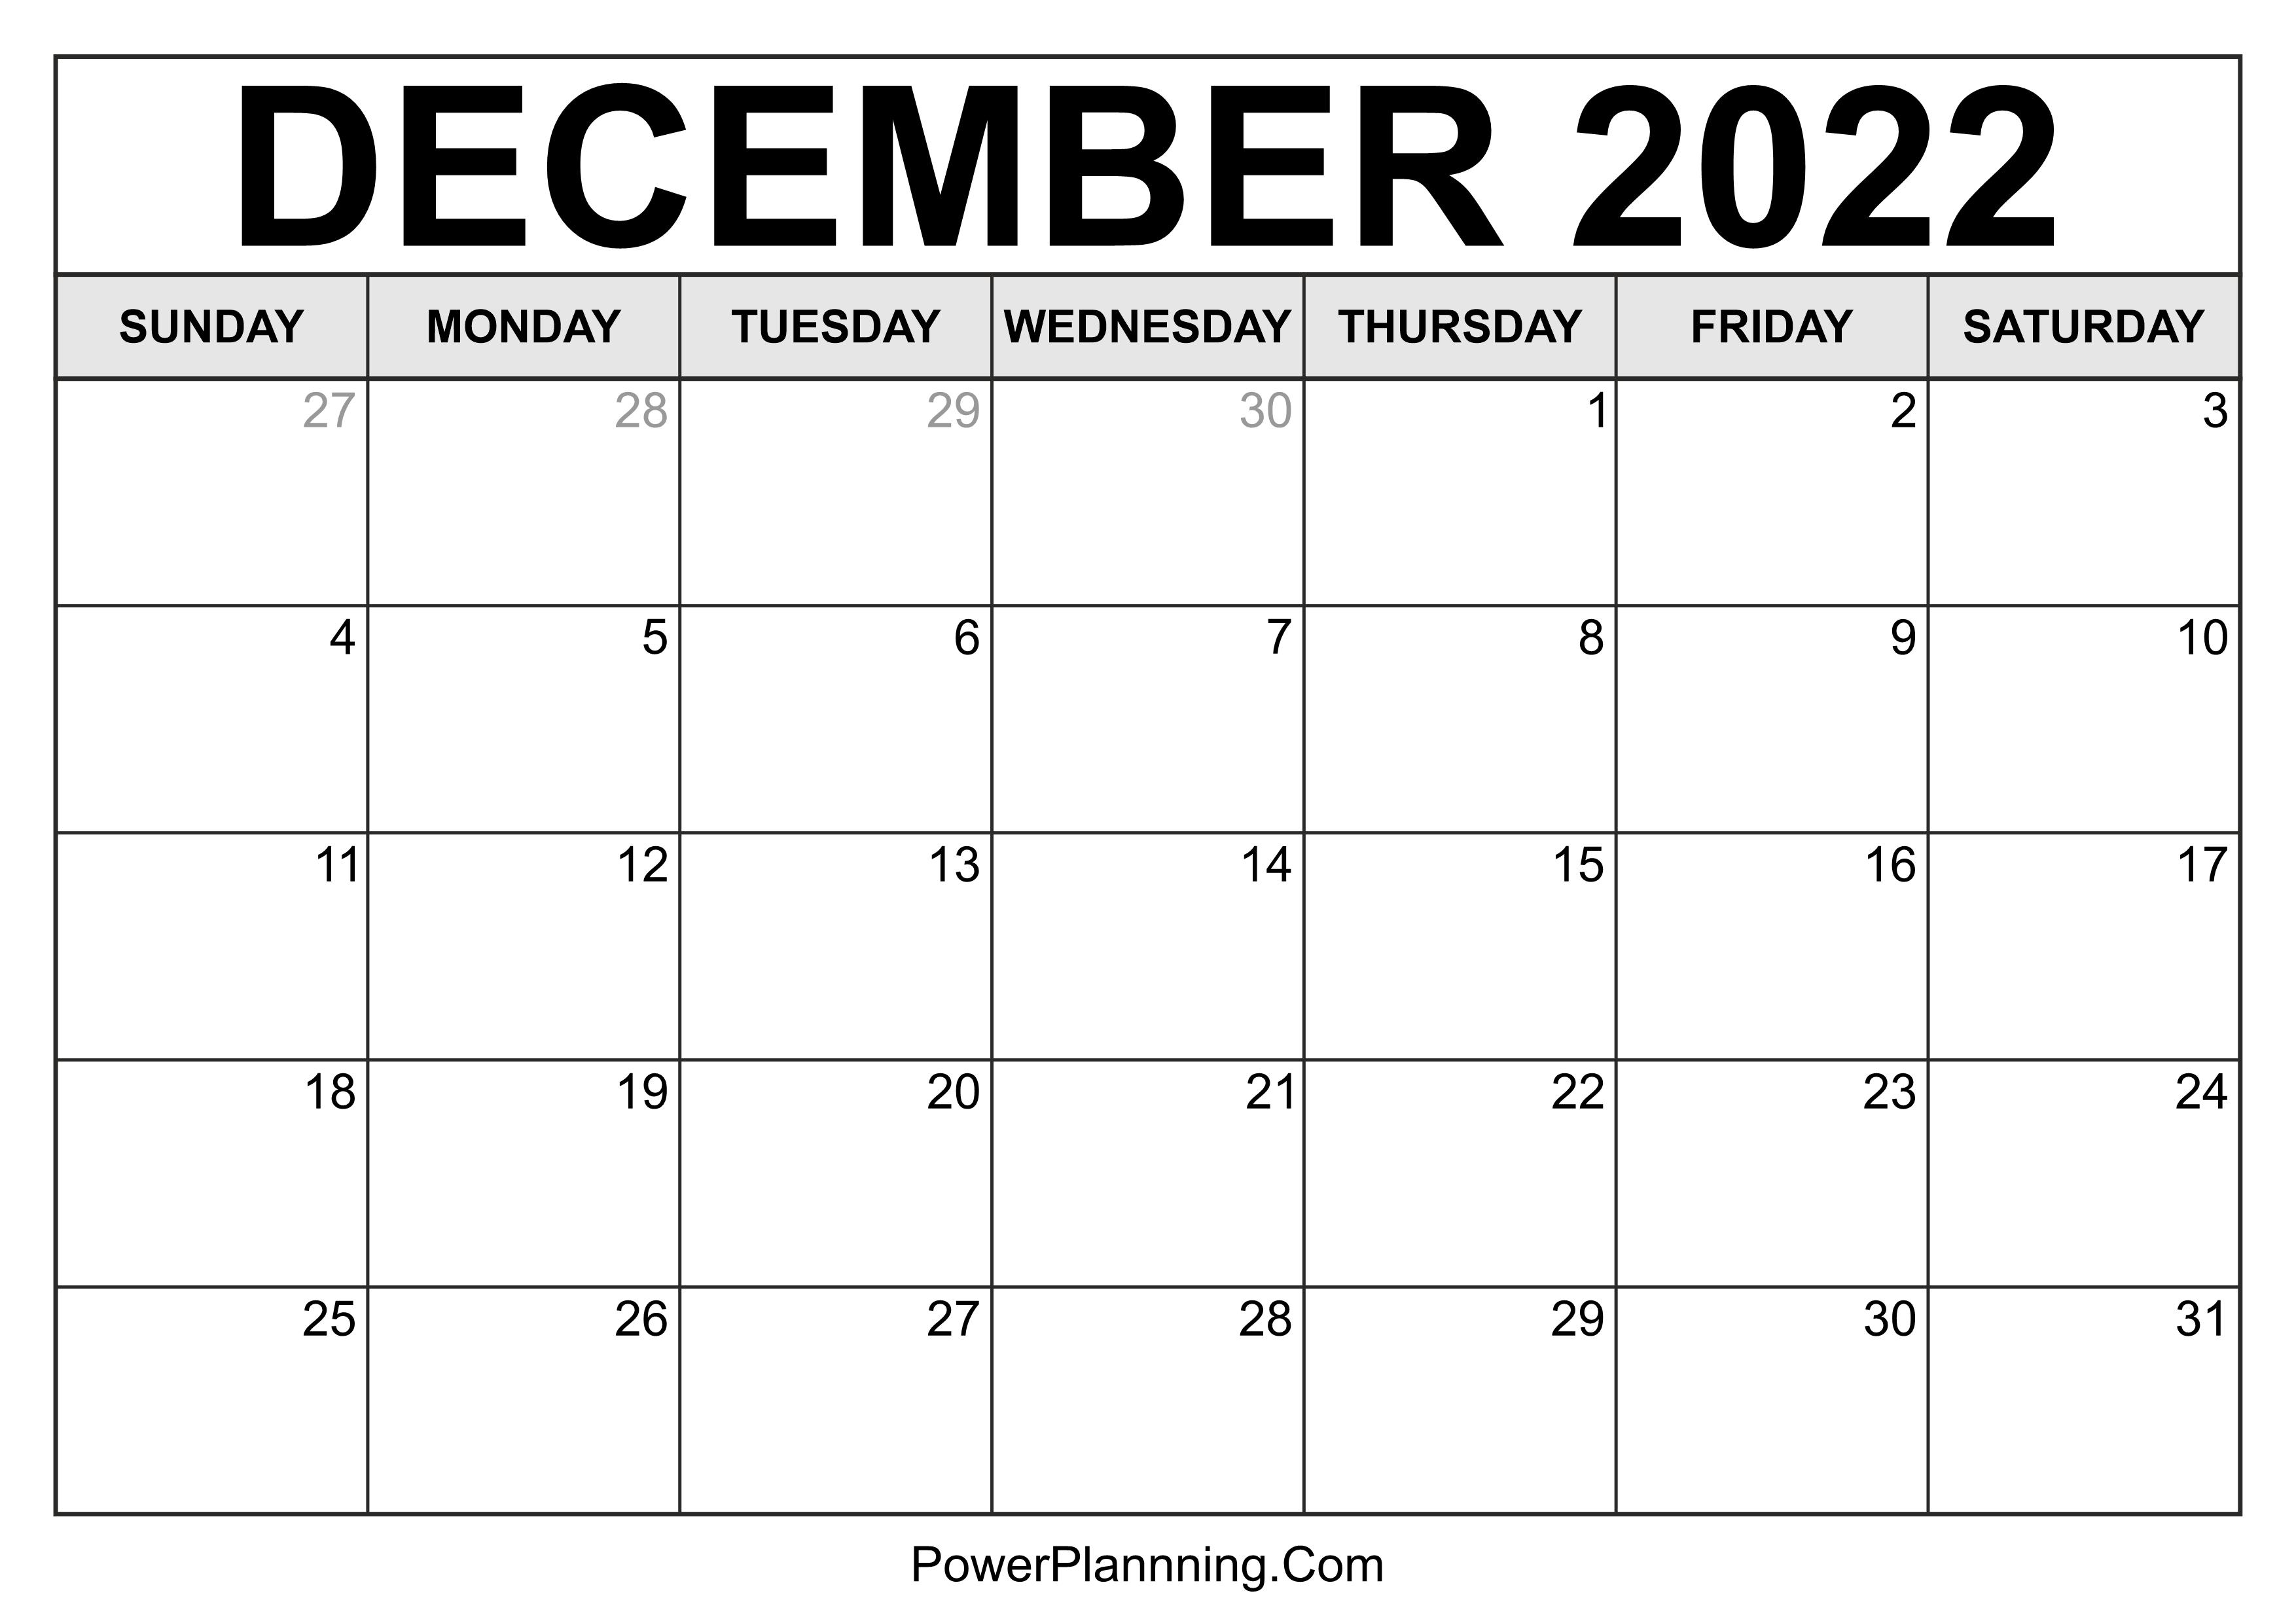 December 2022 Calendar